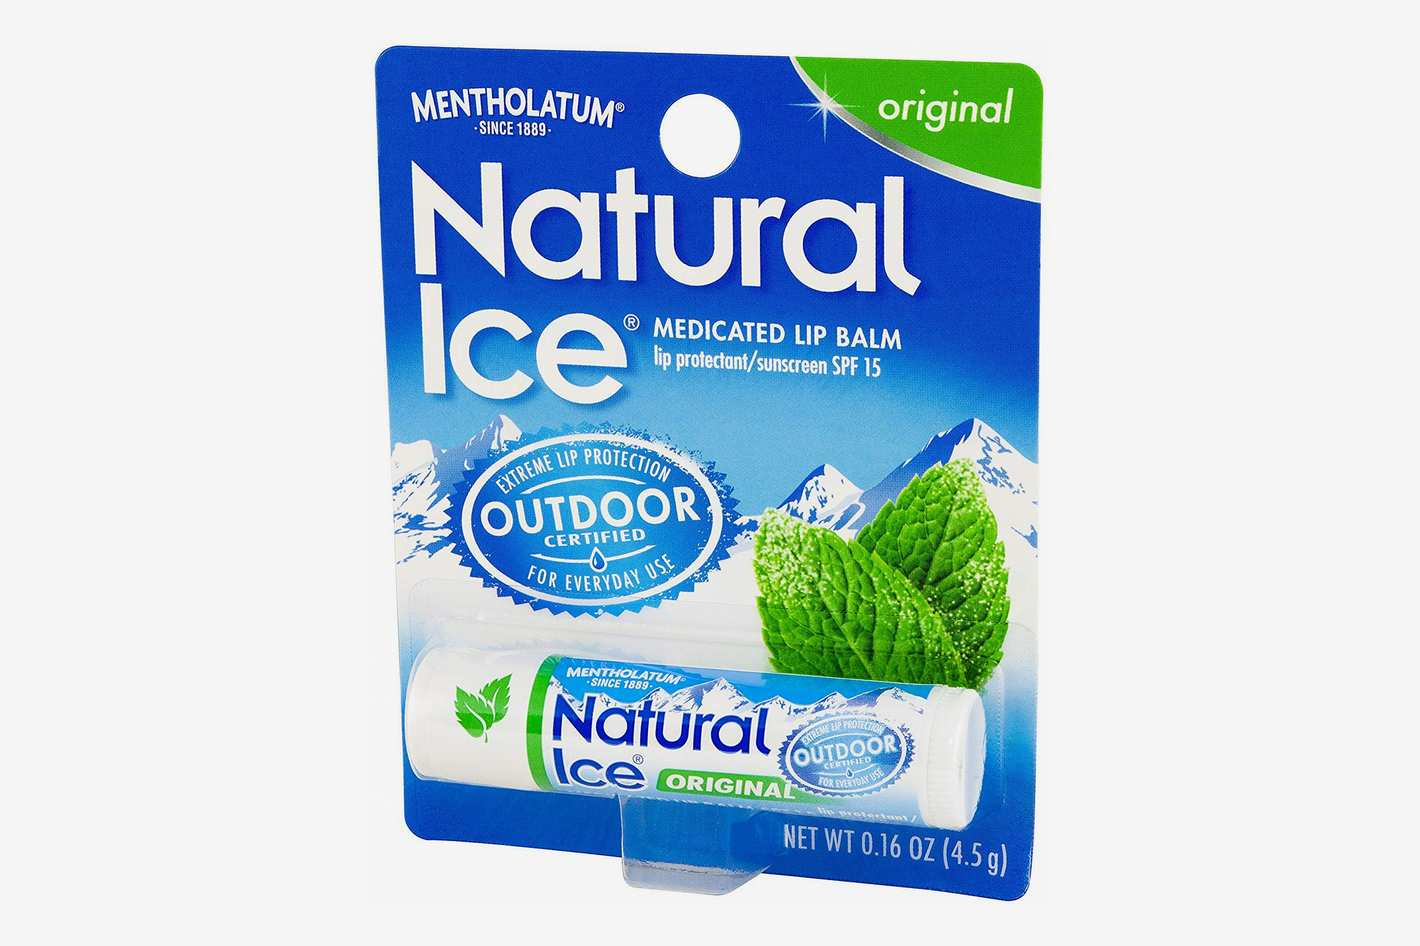 Mentholatum Natural Ice Lip Balm